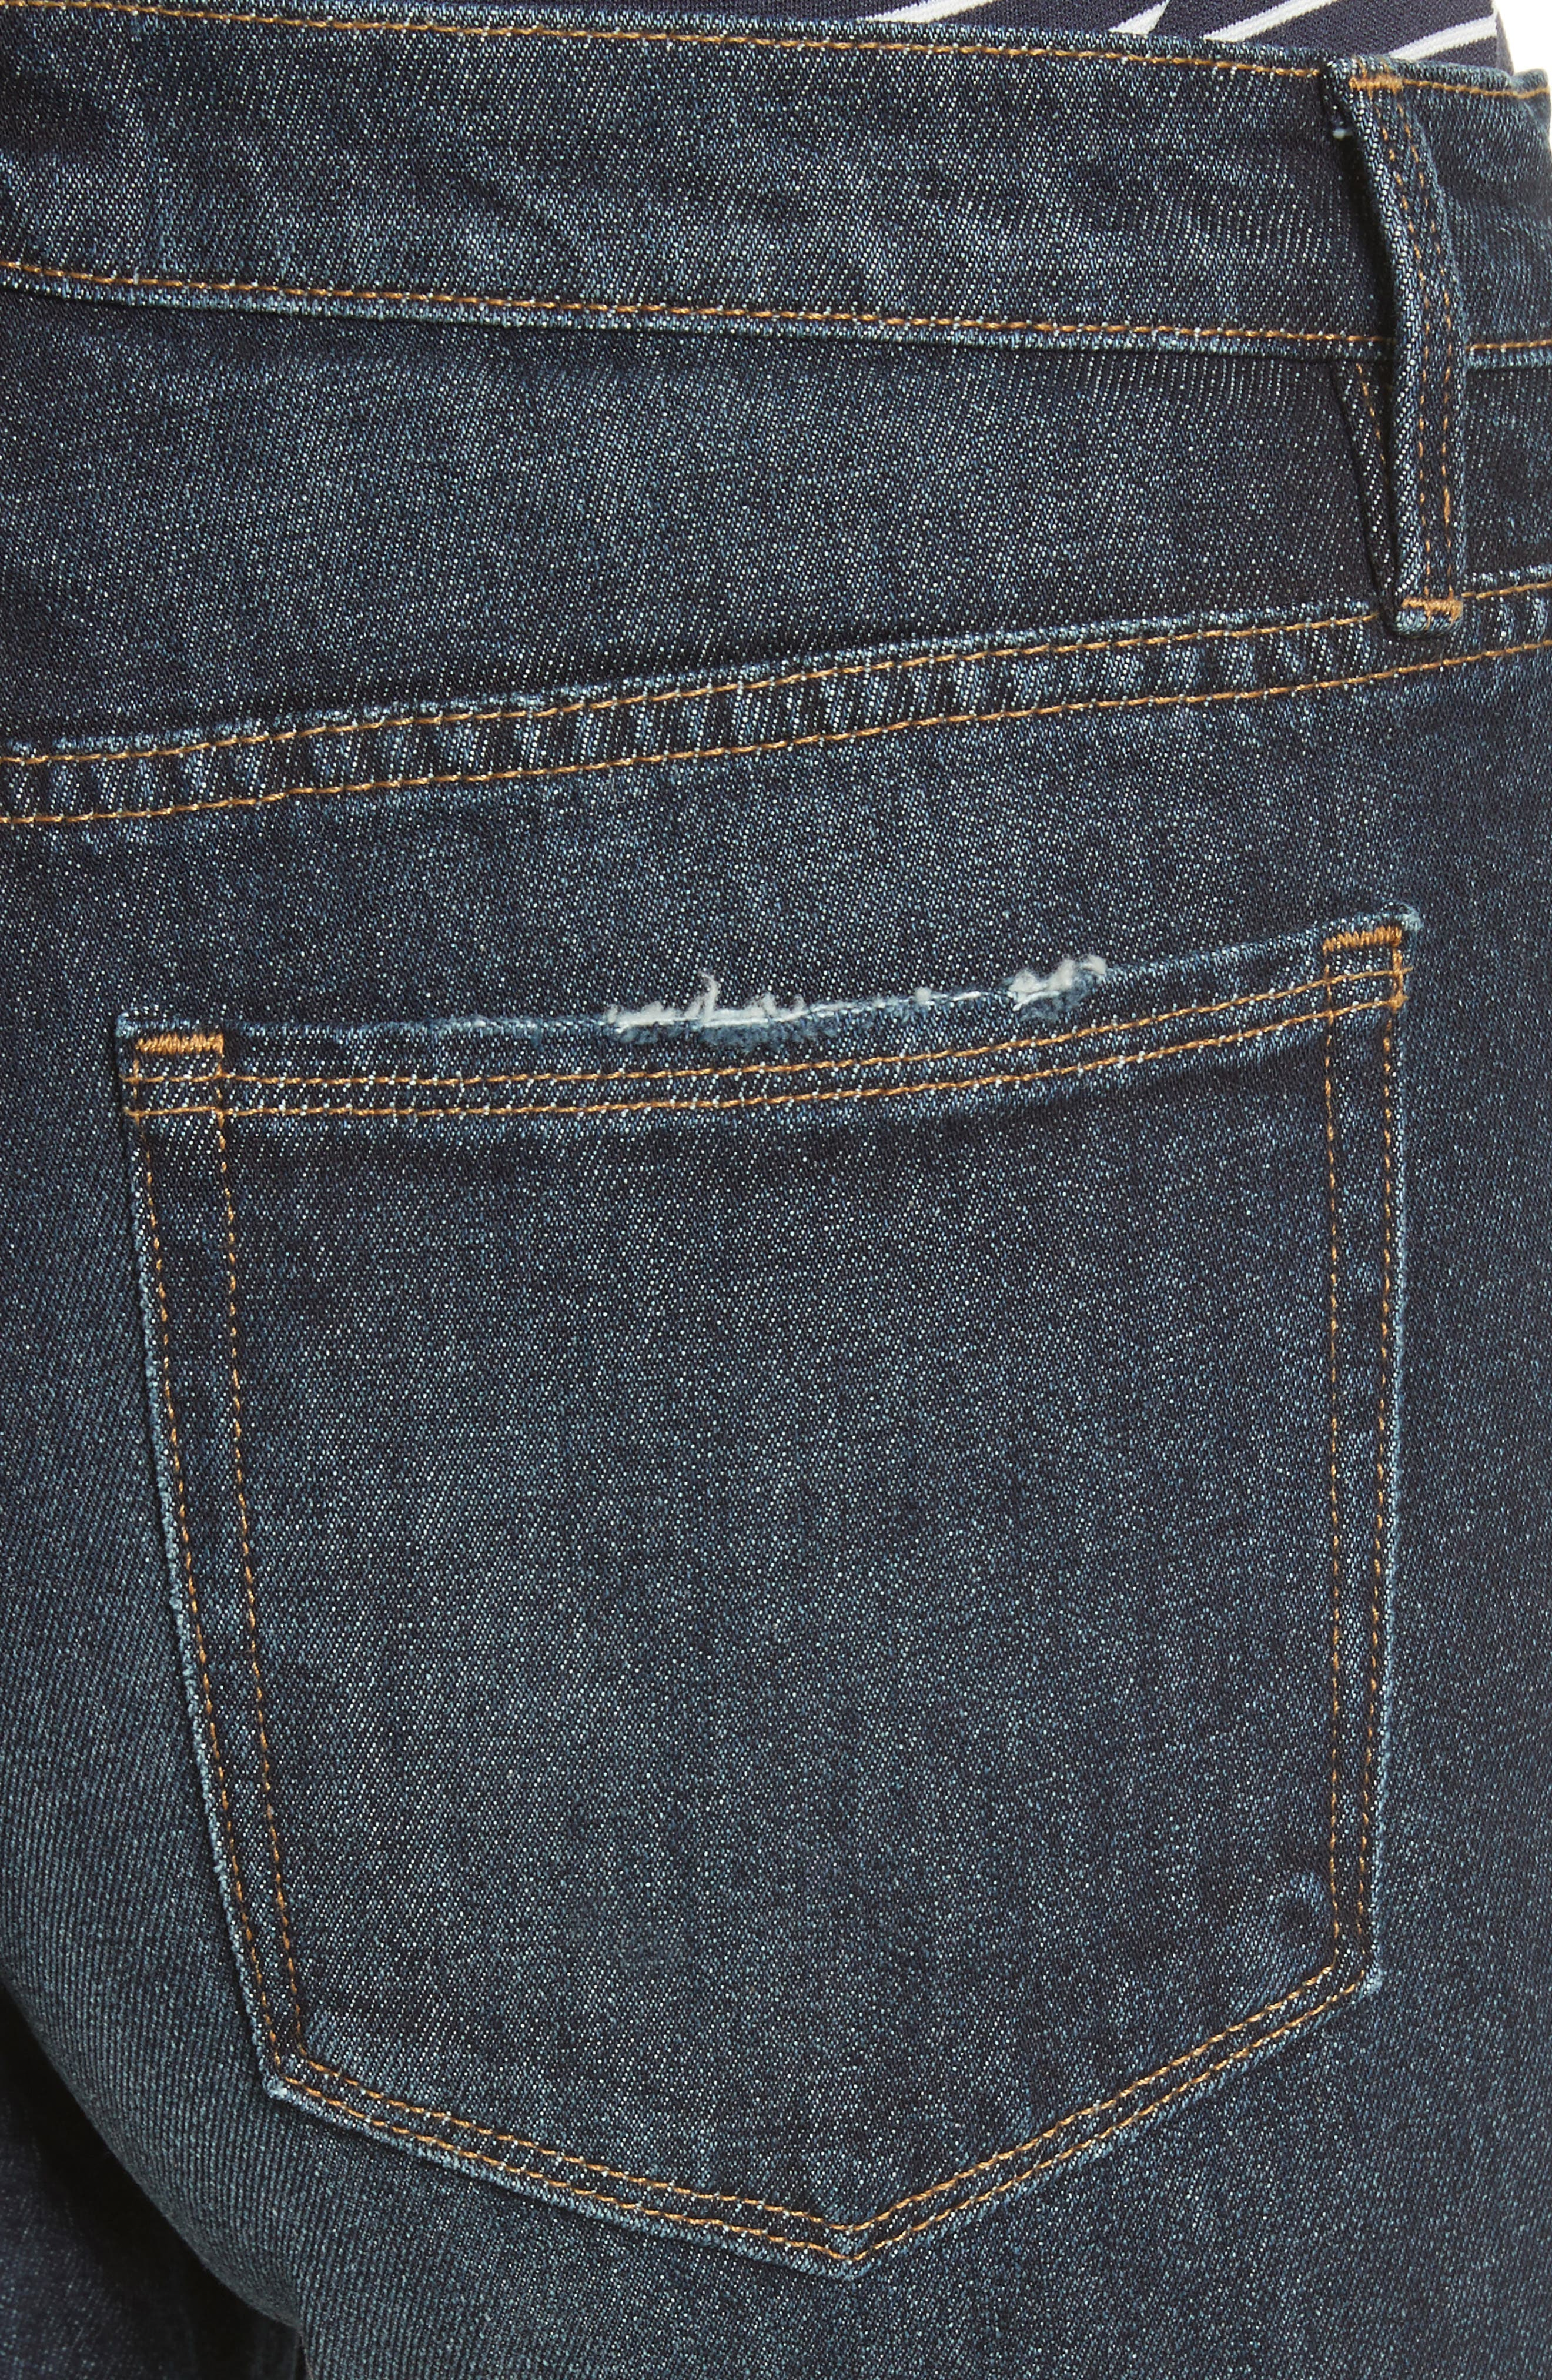 Straight Leg Ankle Jeans,                             Alternate thumbnail 7, color,                             Ellisfield